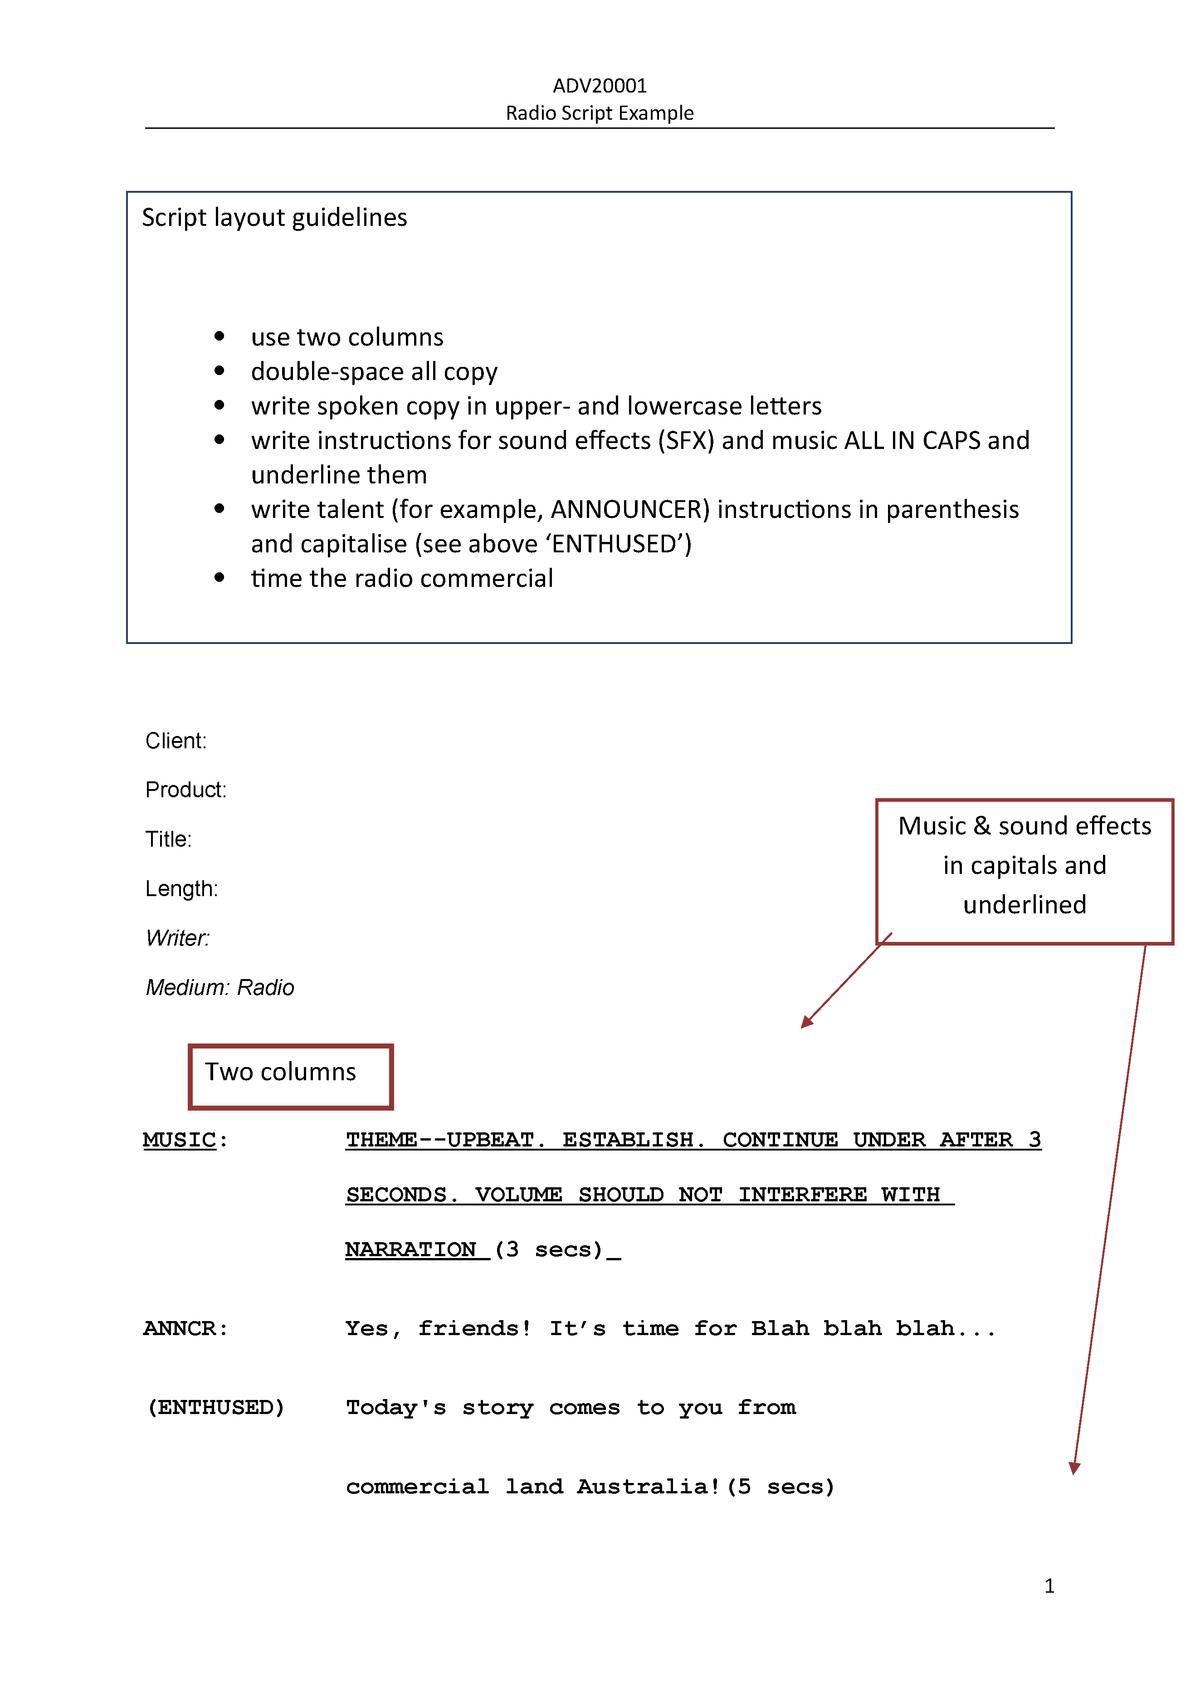 Example-Radio script - Tutorial sample - ADV20002 - StuDocu